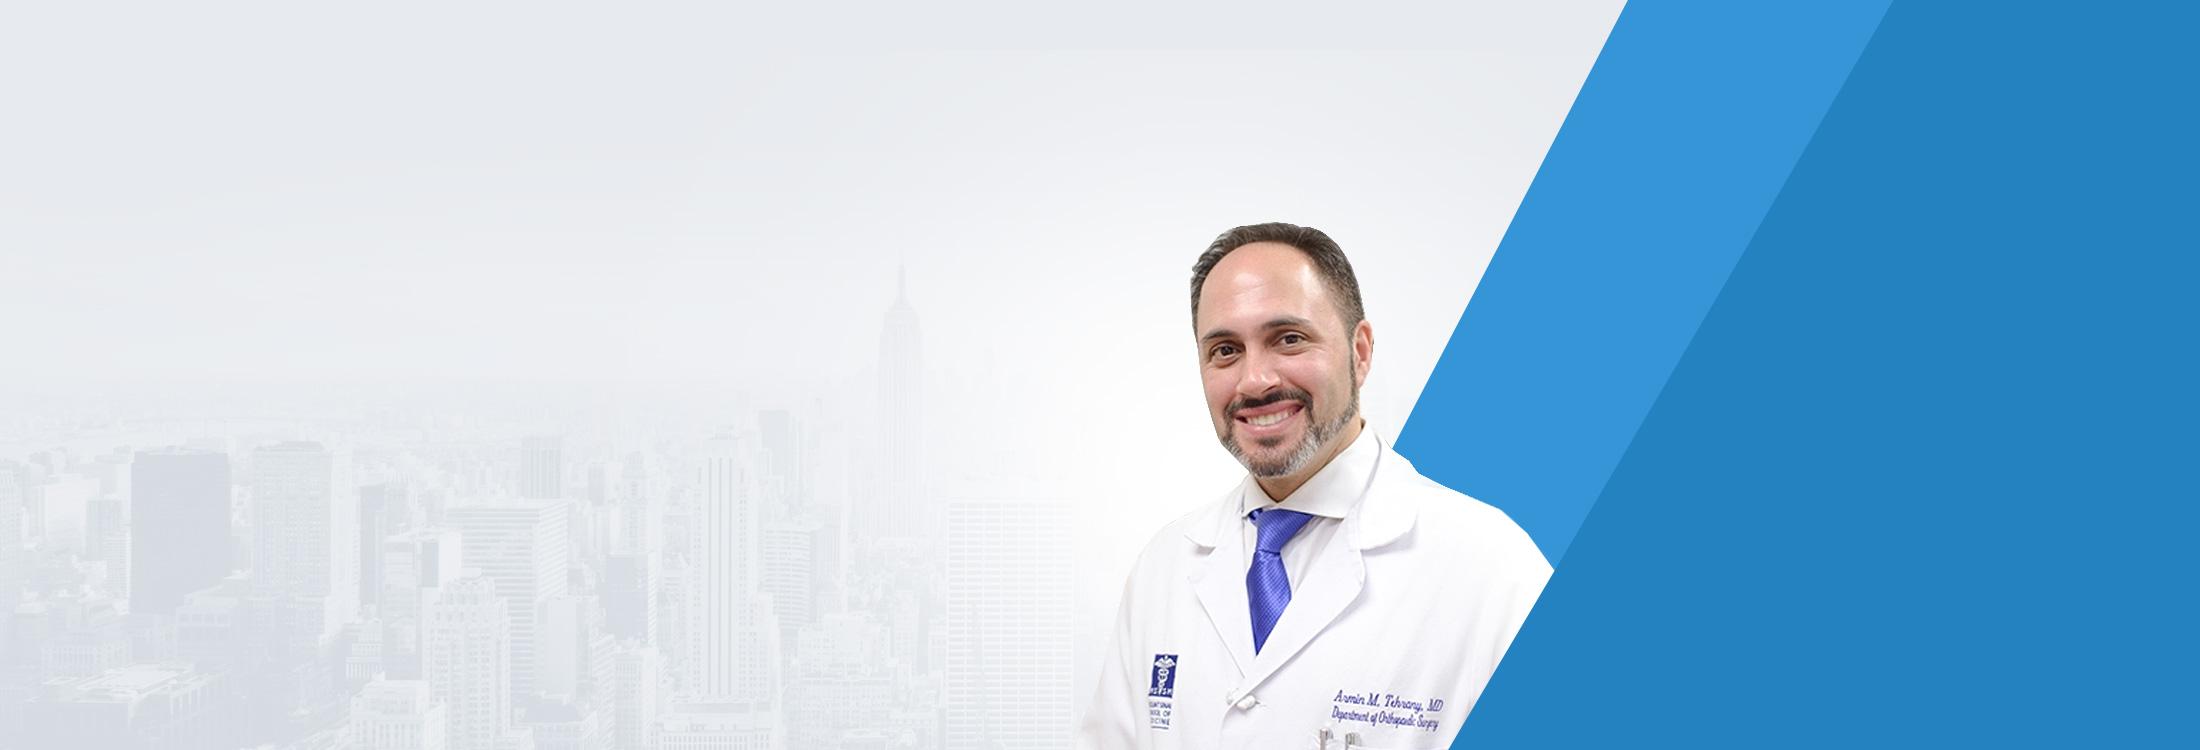 Dr. Armin Tehrany - New York Orthopedic Doctor